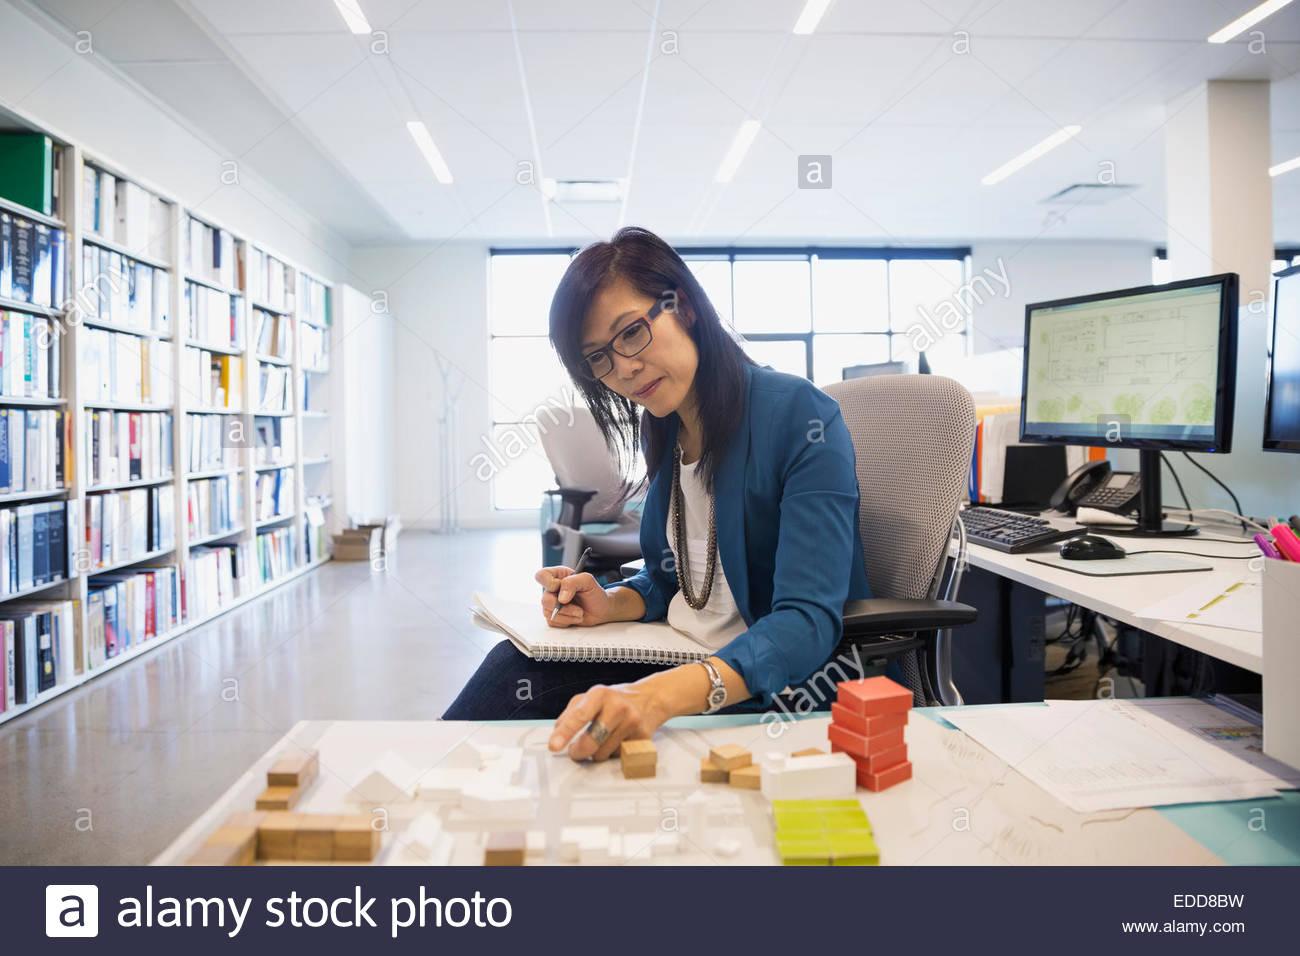 Architect examining model in office - Stock Image